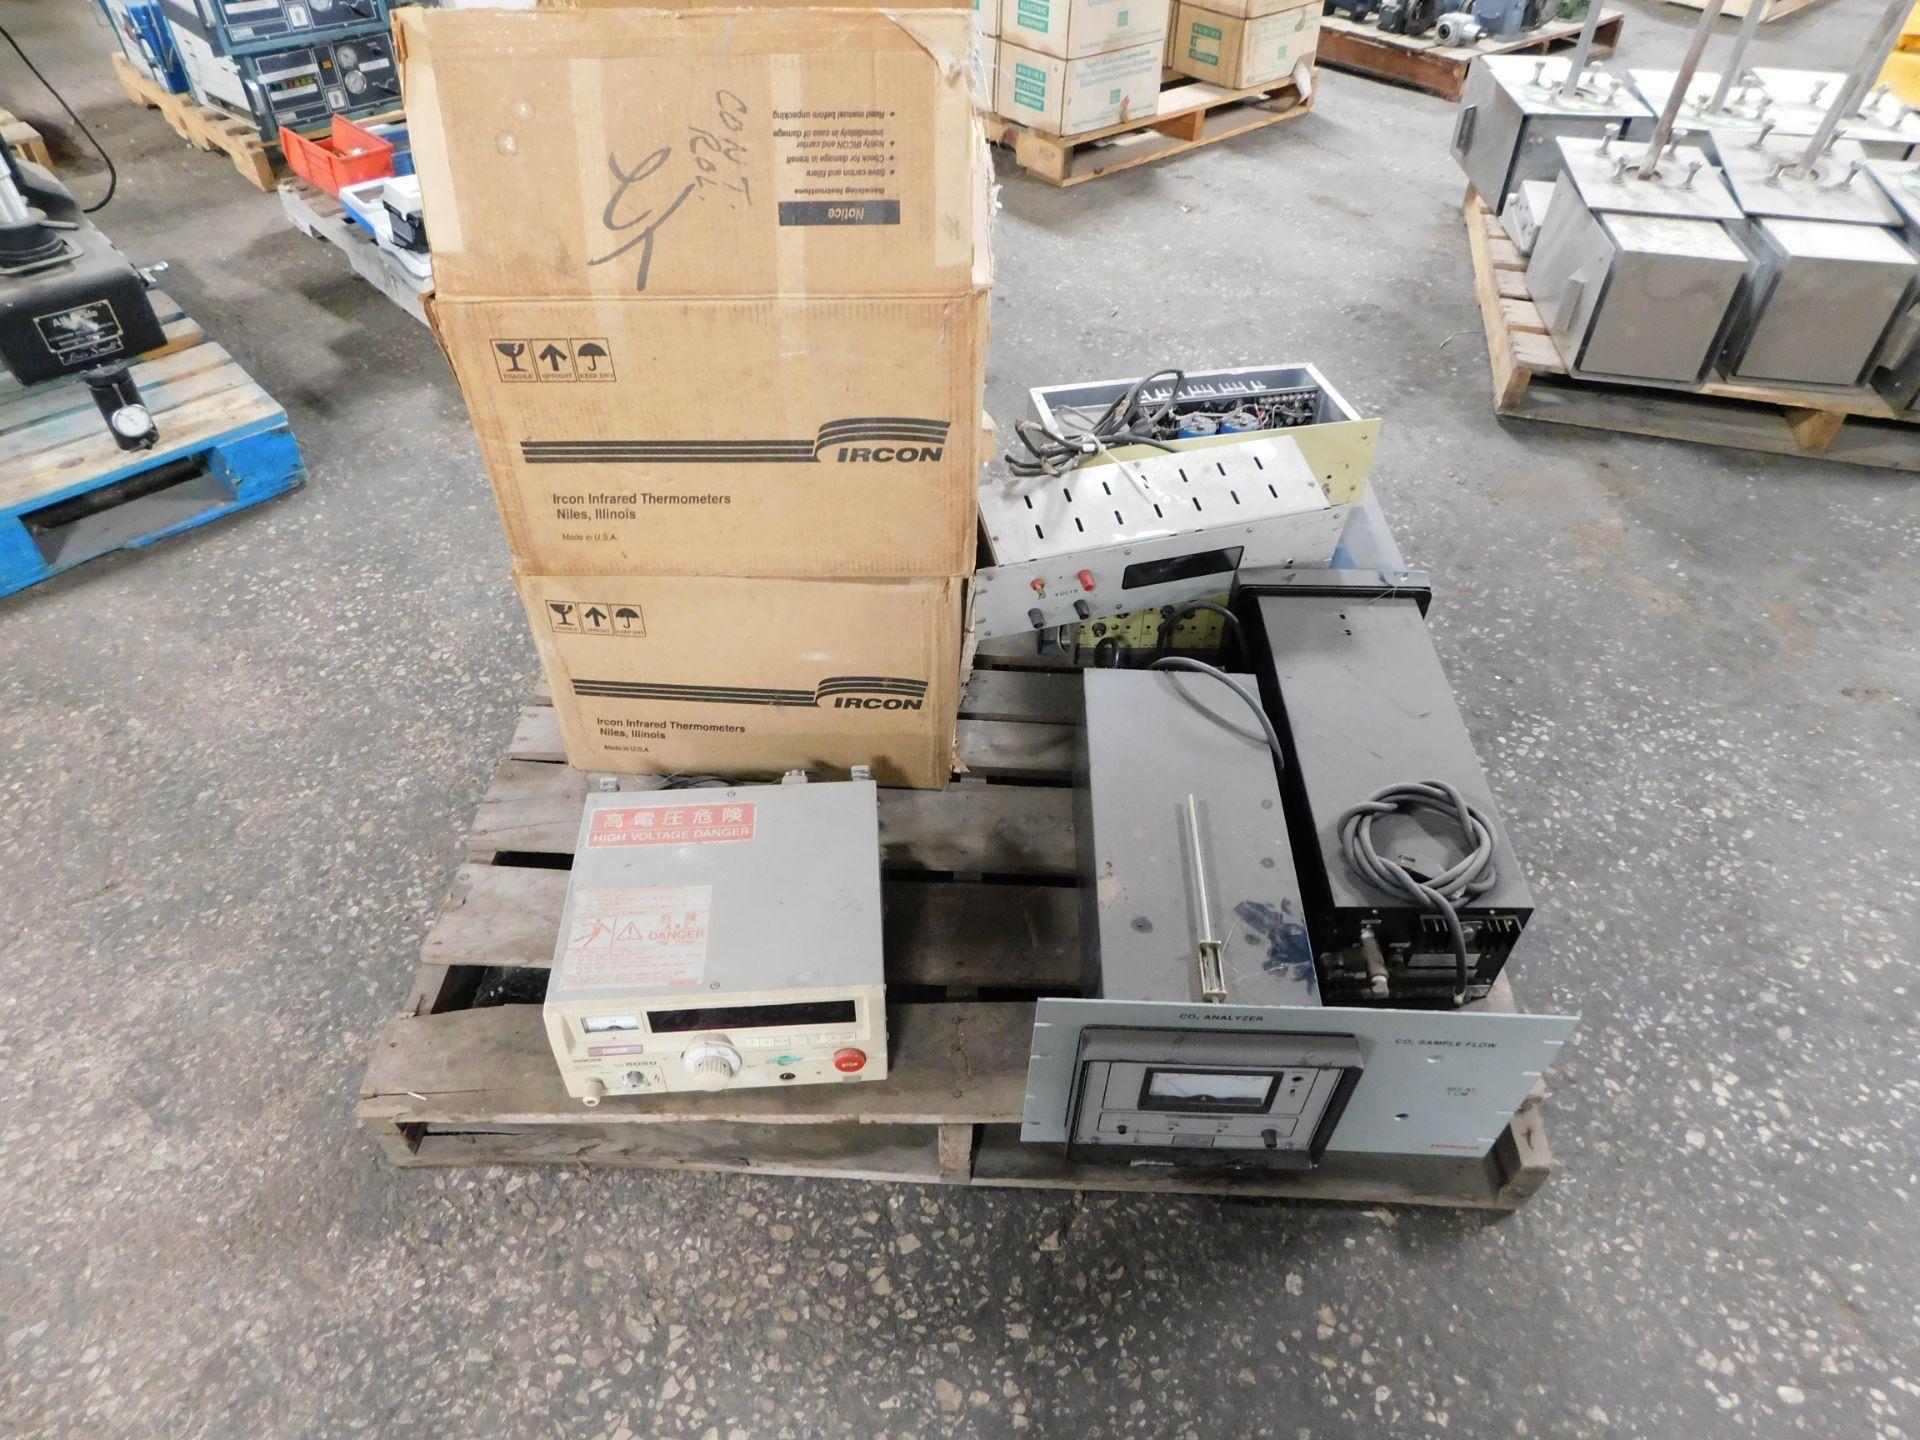 Miscellaneous Lab / Test Equipment